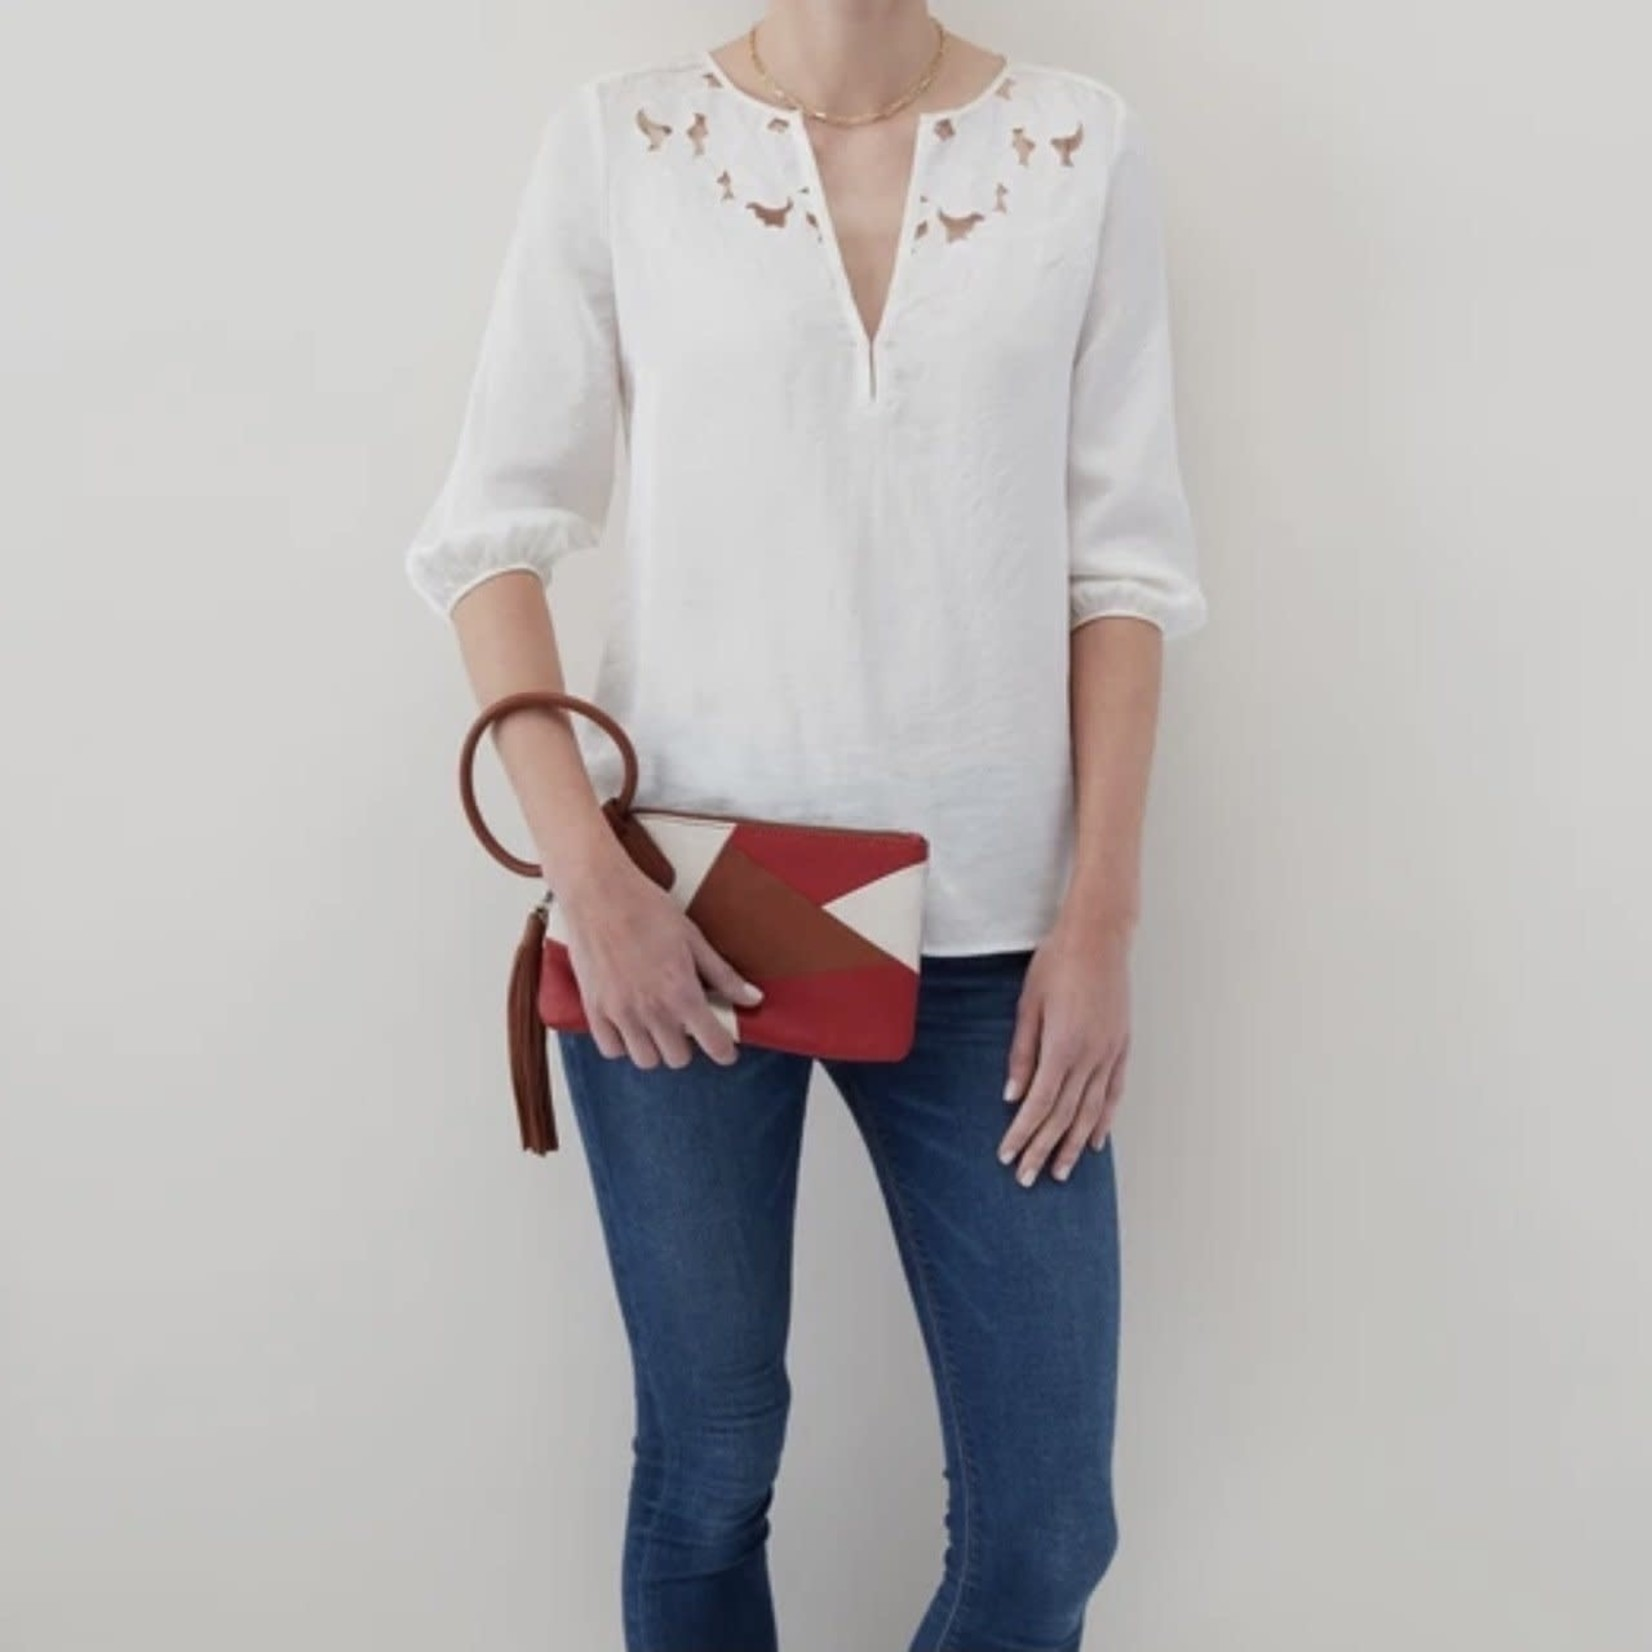 HOBO Sable Color Block Leather Wristlet w/Loop